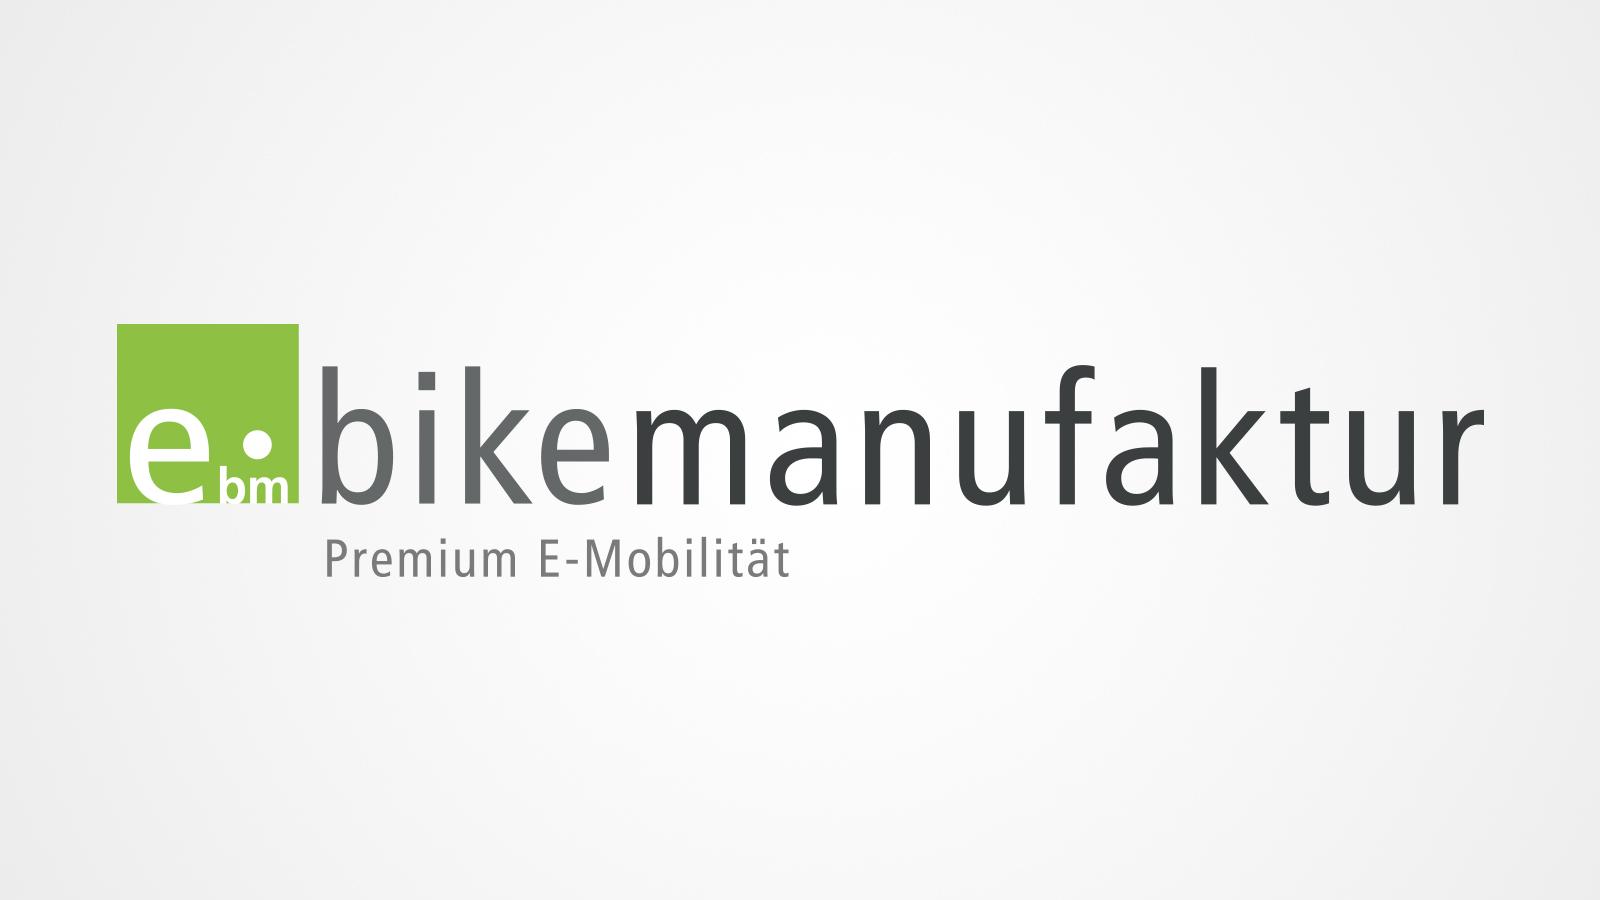 e.bikemanufaktur